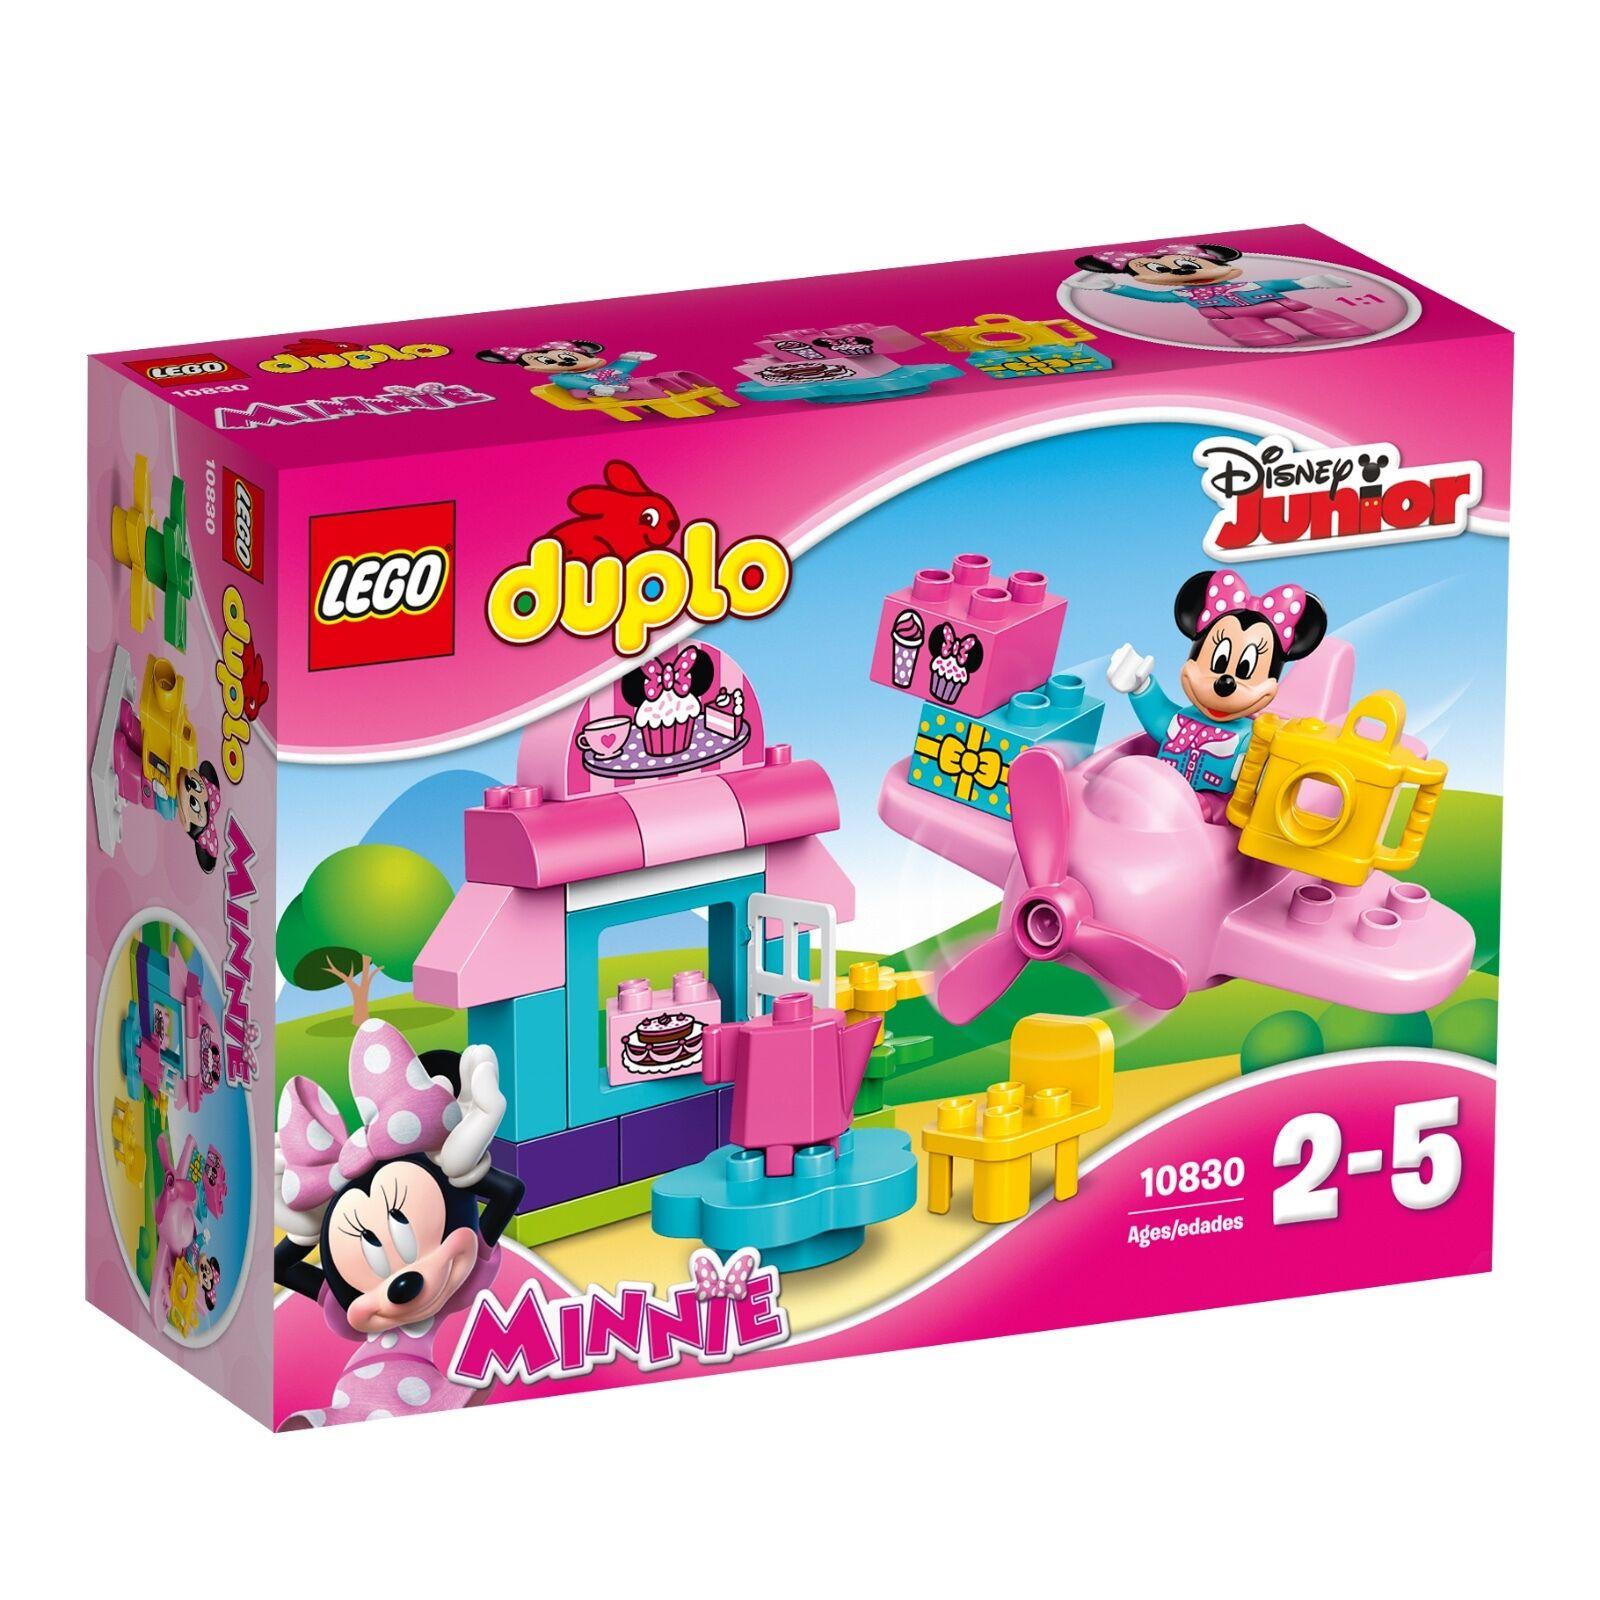 LEGO ® DUPLO ® 10830 Minnies café neuf emballage d'origine _ Minnie 's café New MISB NRFB